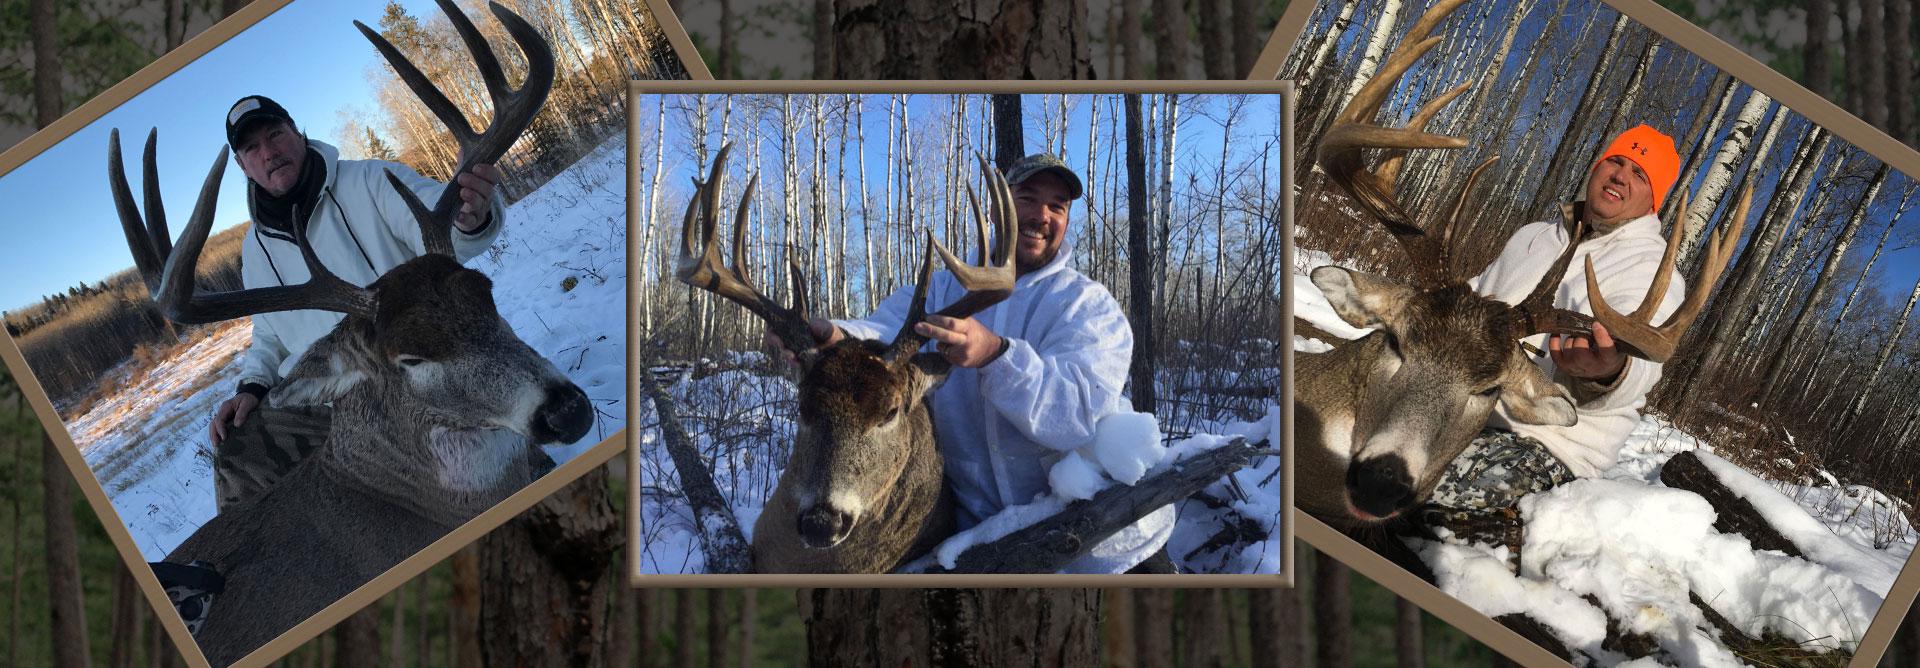 sk-whitetail-deer-hunting